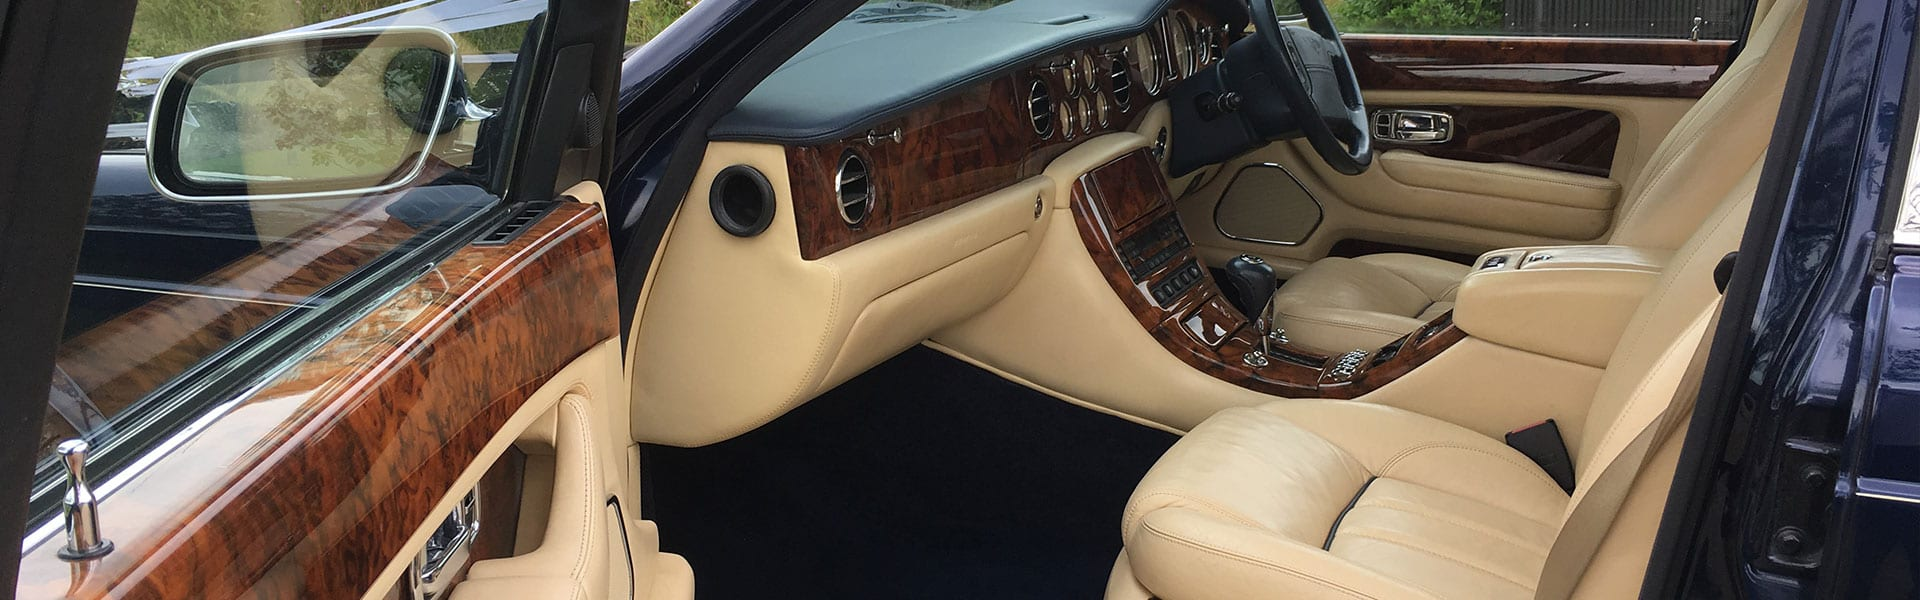 Bentley-Arnage-in-Blue-Hero-Slider-1920×500-5